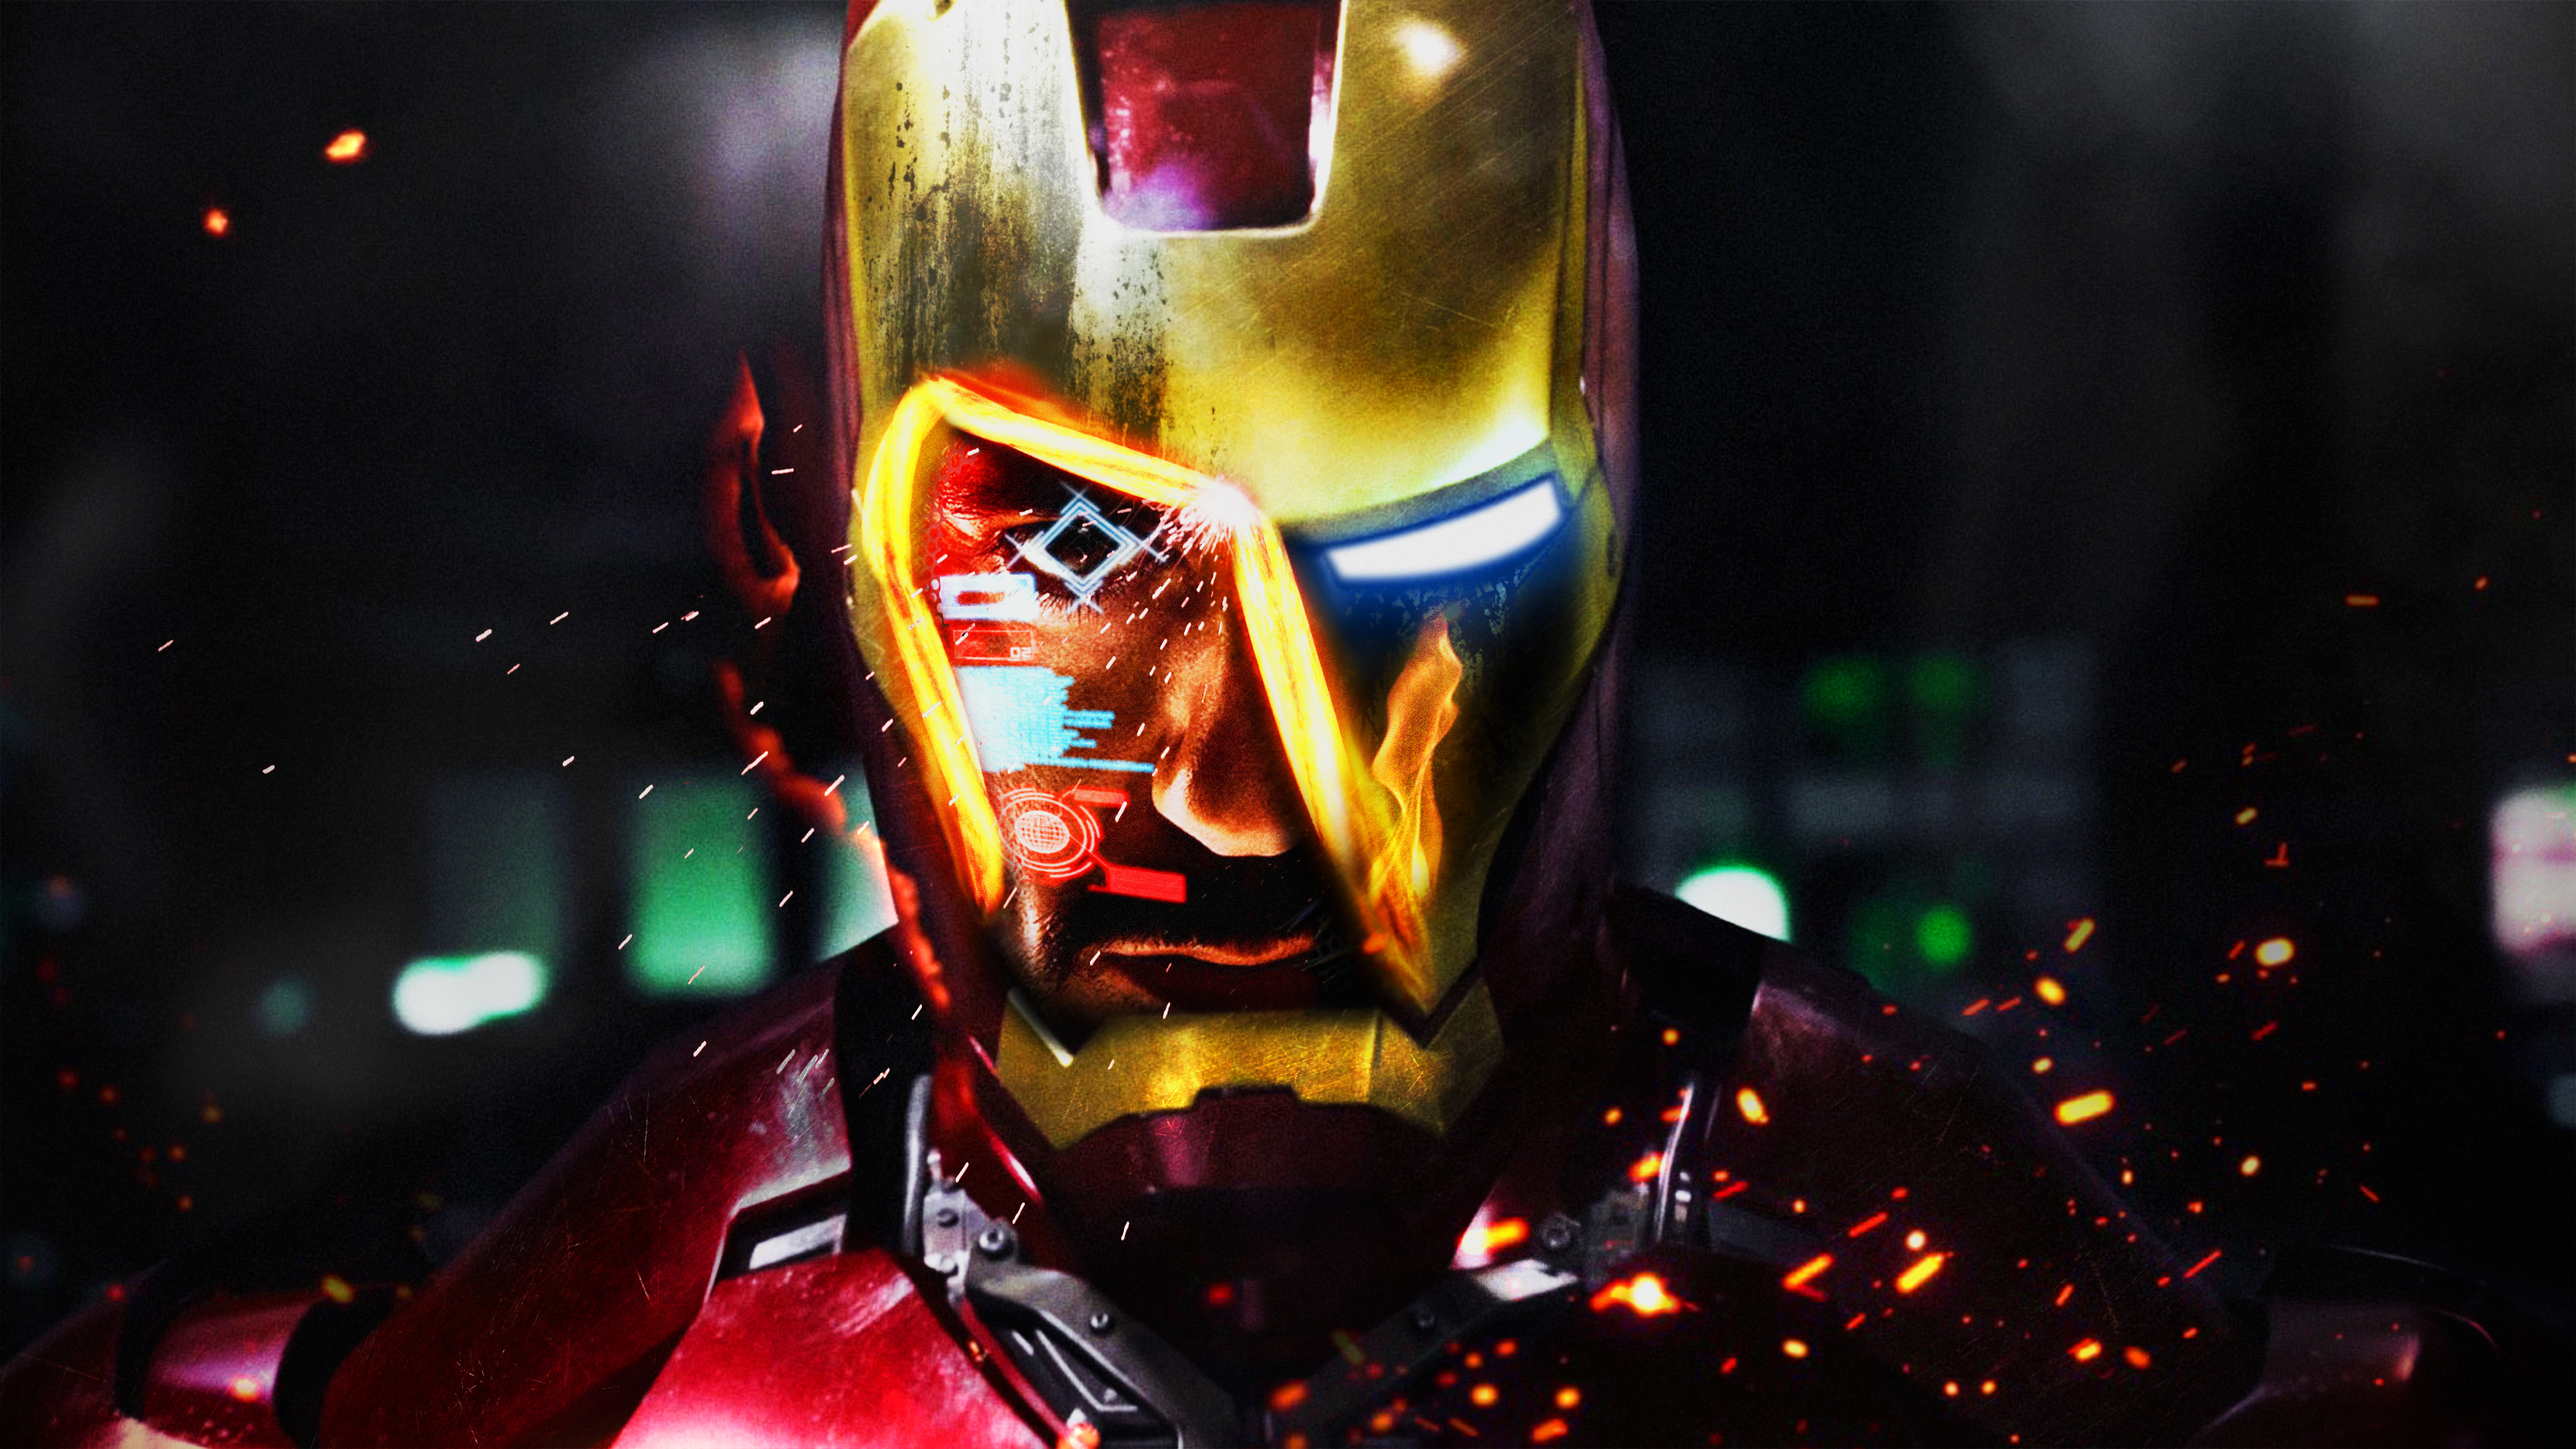 Iron man 4k ultra hd wallpaper background image 3840x2160 id 972690 wallpaper abyss - Iron man wallpaper 4k ...